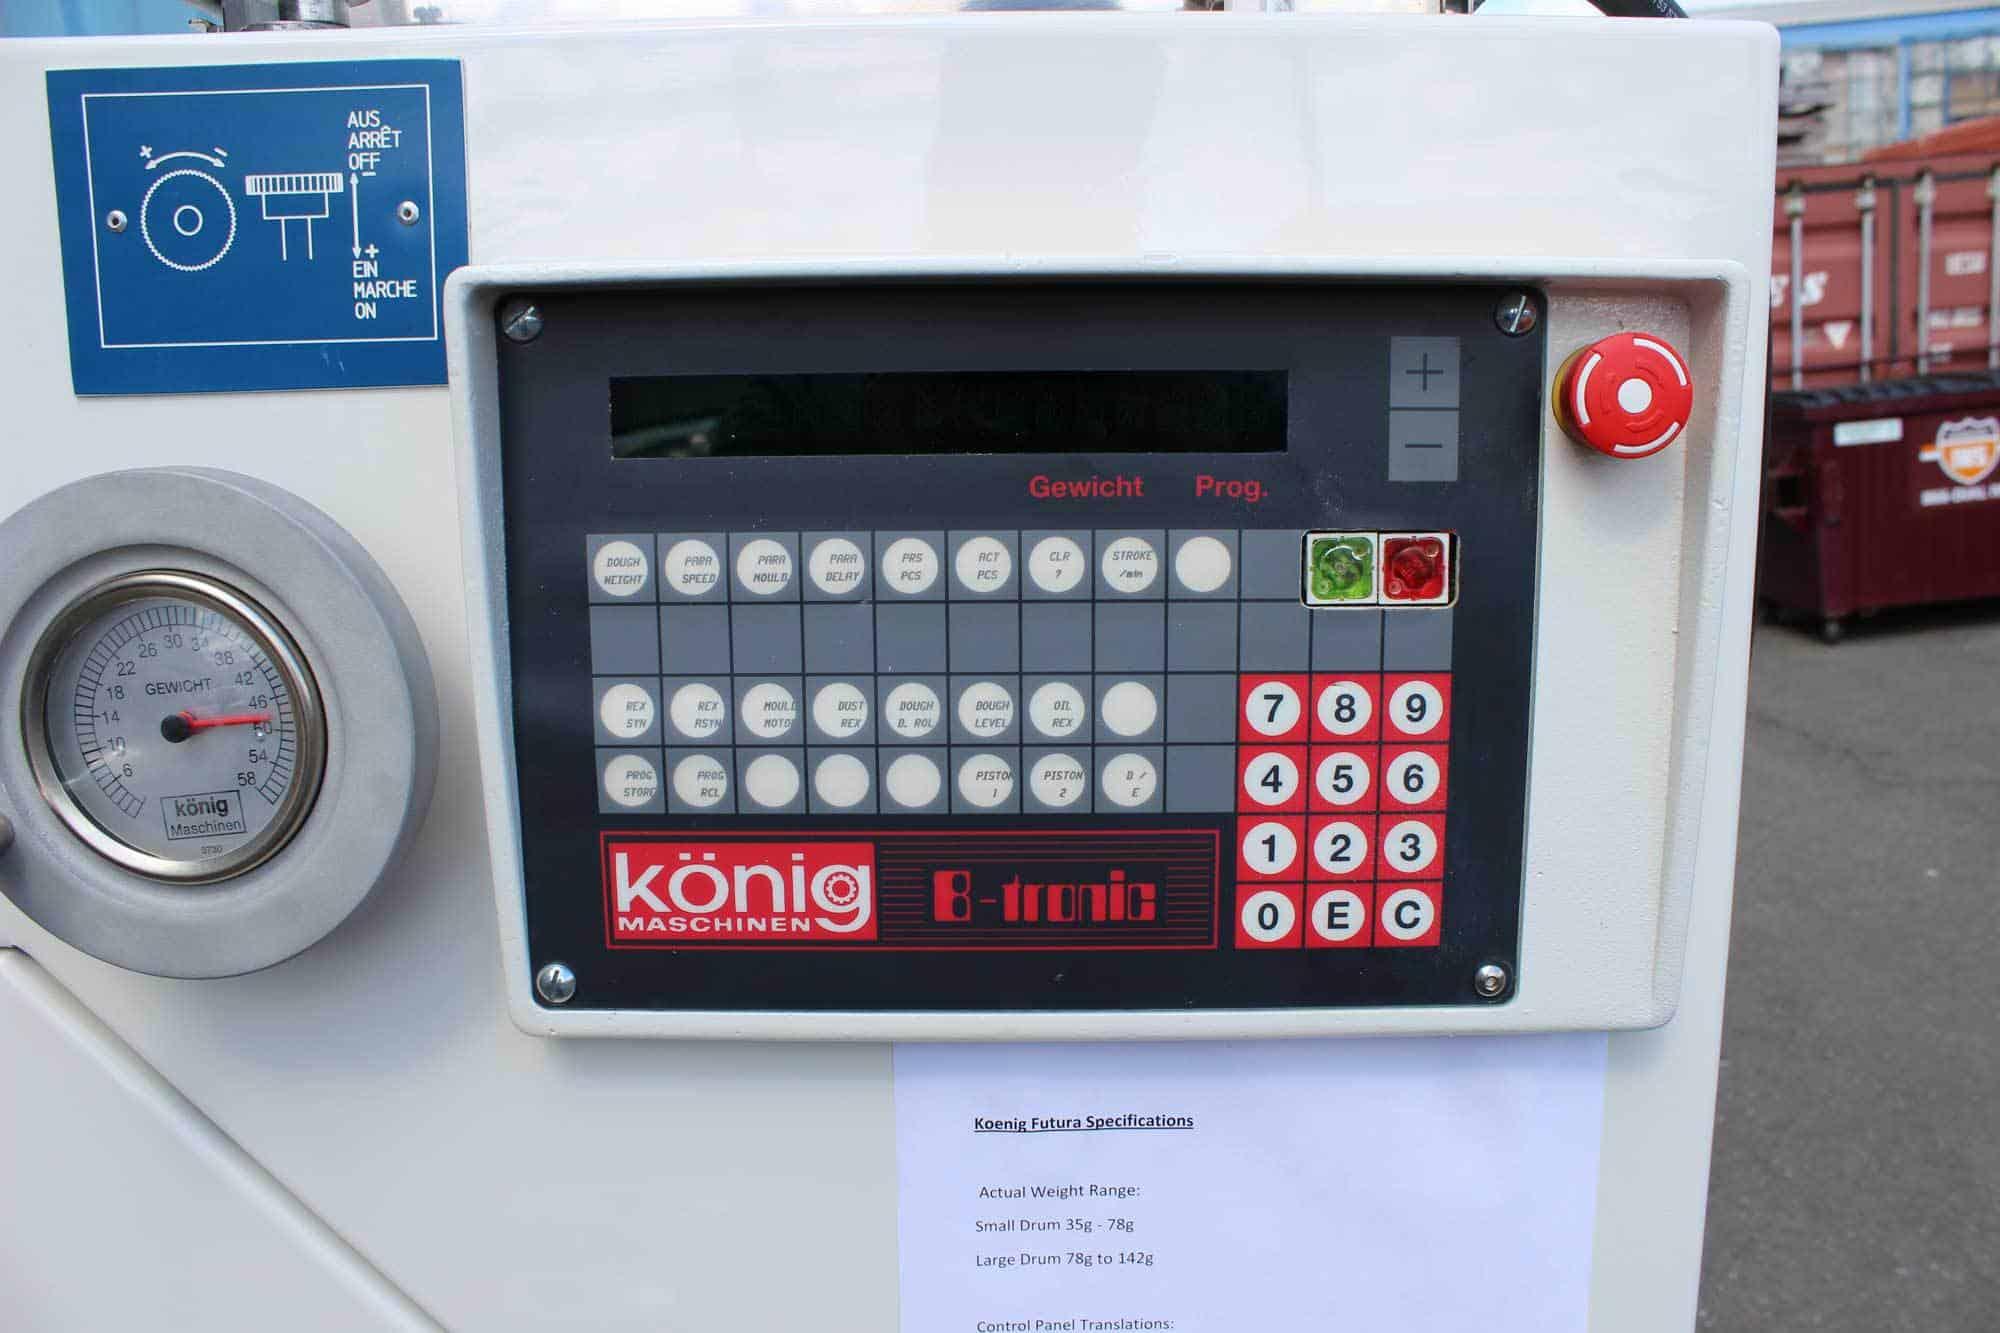 Konig-Futura-Control-Panel